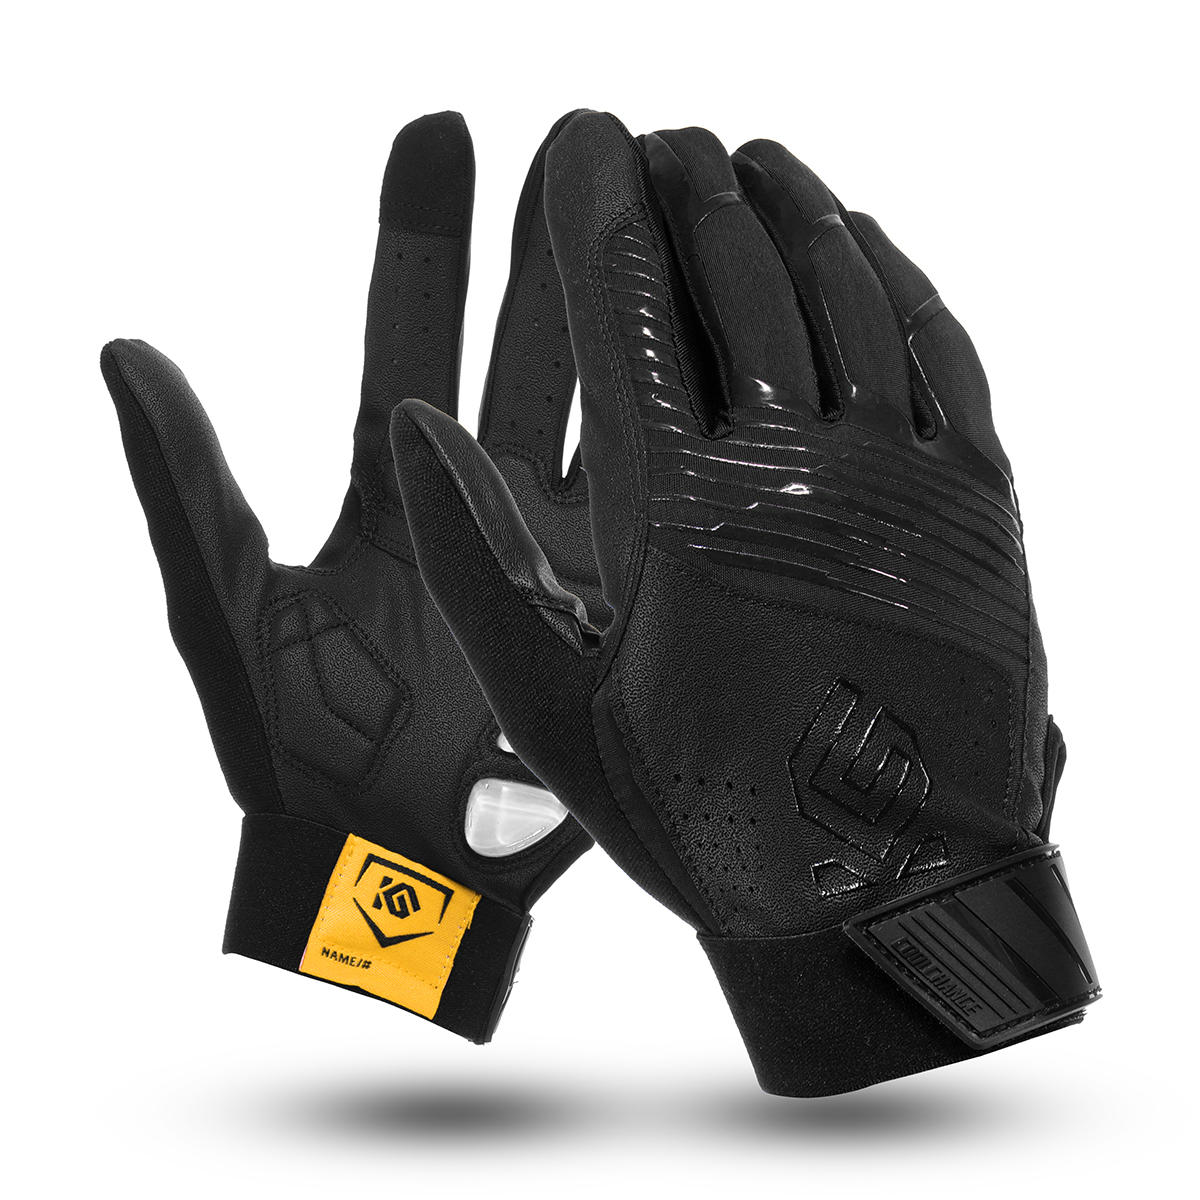 Winter Warm Full Finger Gloves Motorcycle Touch Screen Waterproof Gel Pad PU Leather